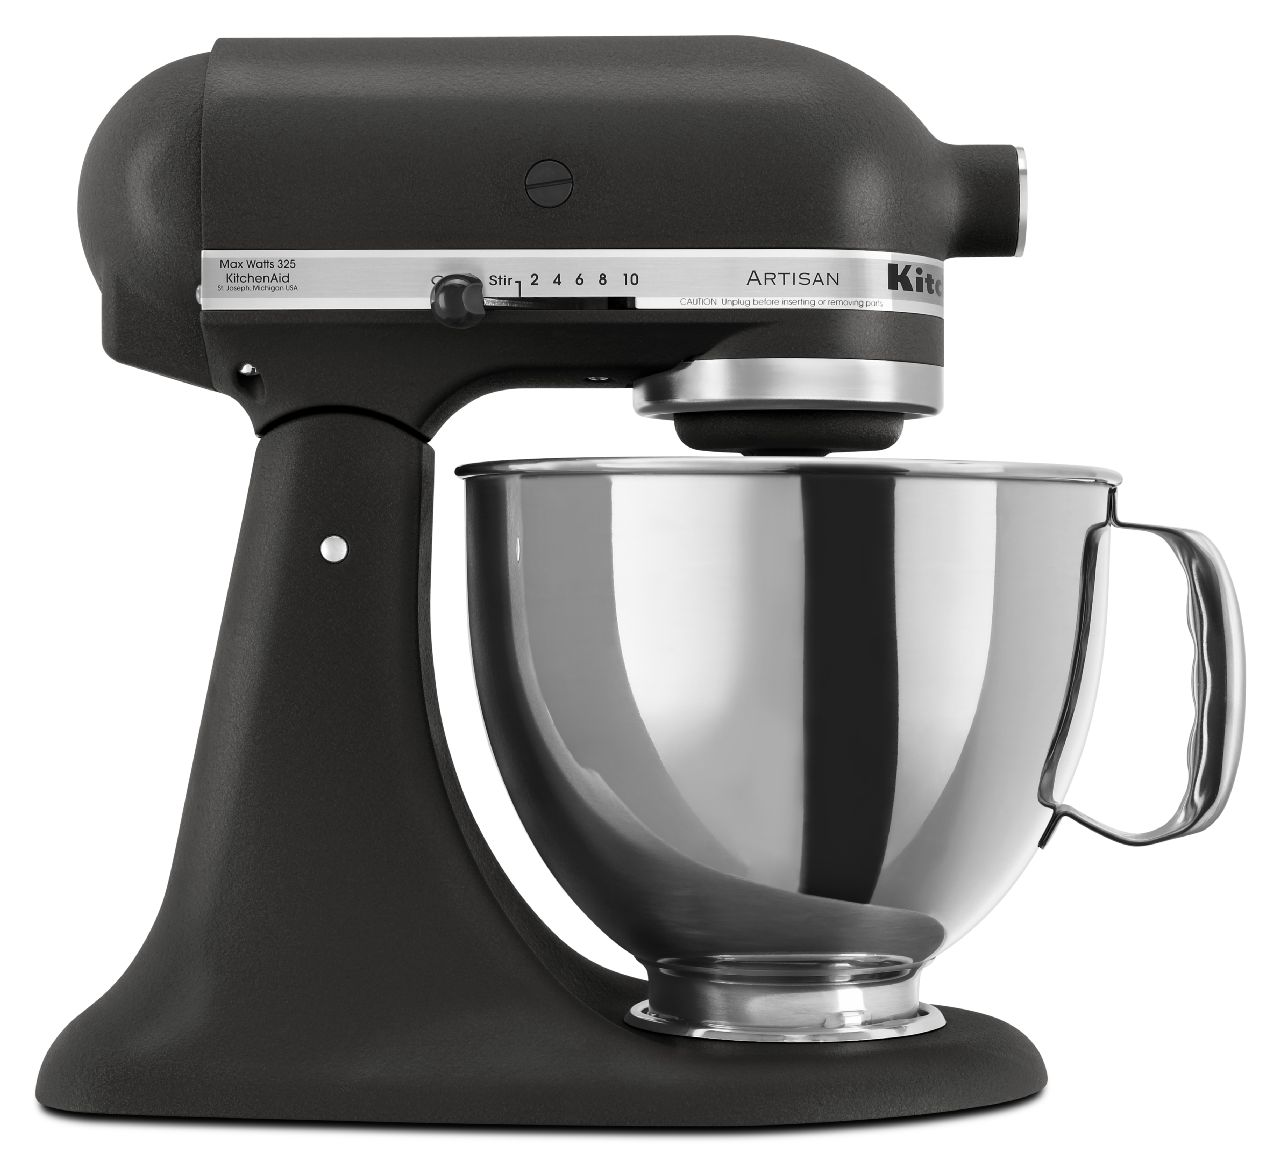 KitchenAid-Artisan-Series-5-Quart-Tilt-Head-Stand-Mixer-10-Speeds-KSM150PS thumbnail 70